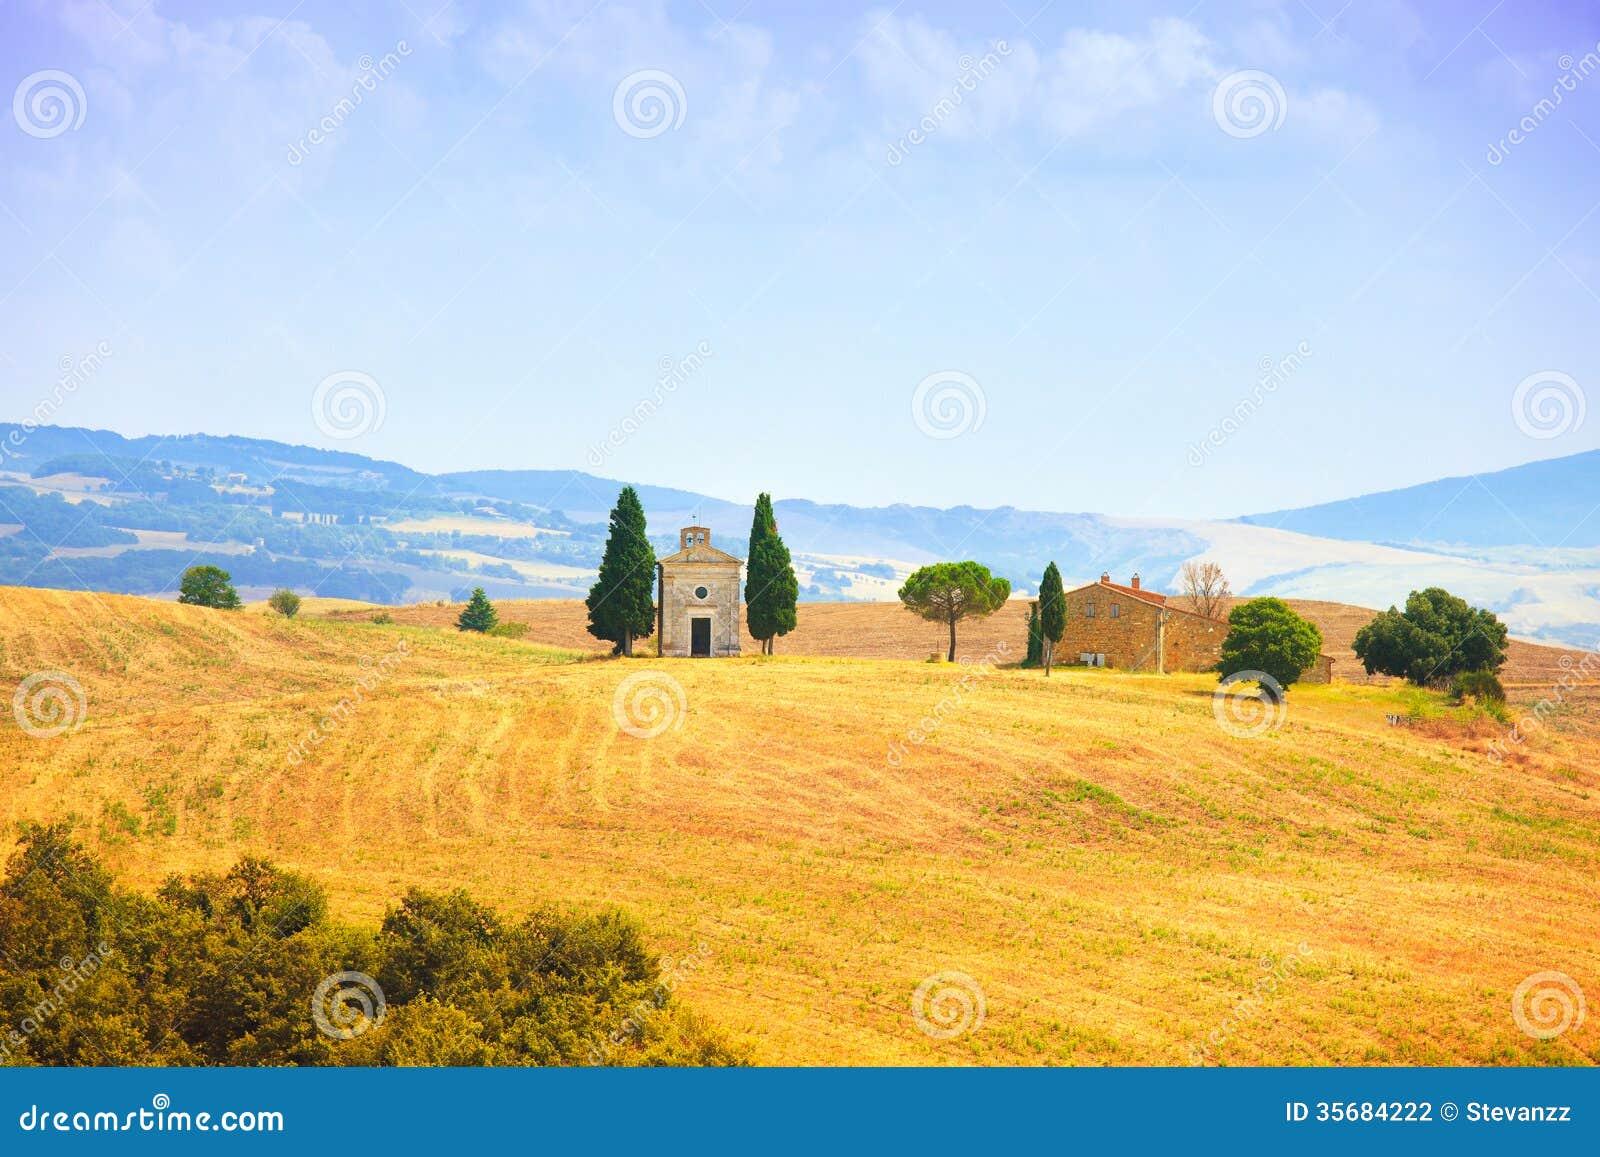 italian landscape with ox - photo #25